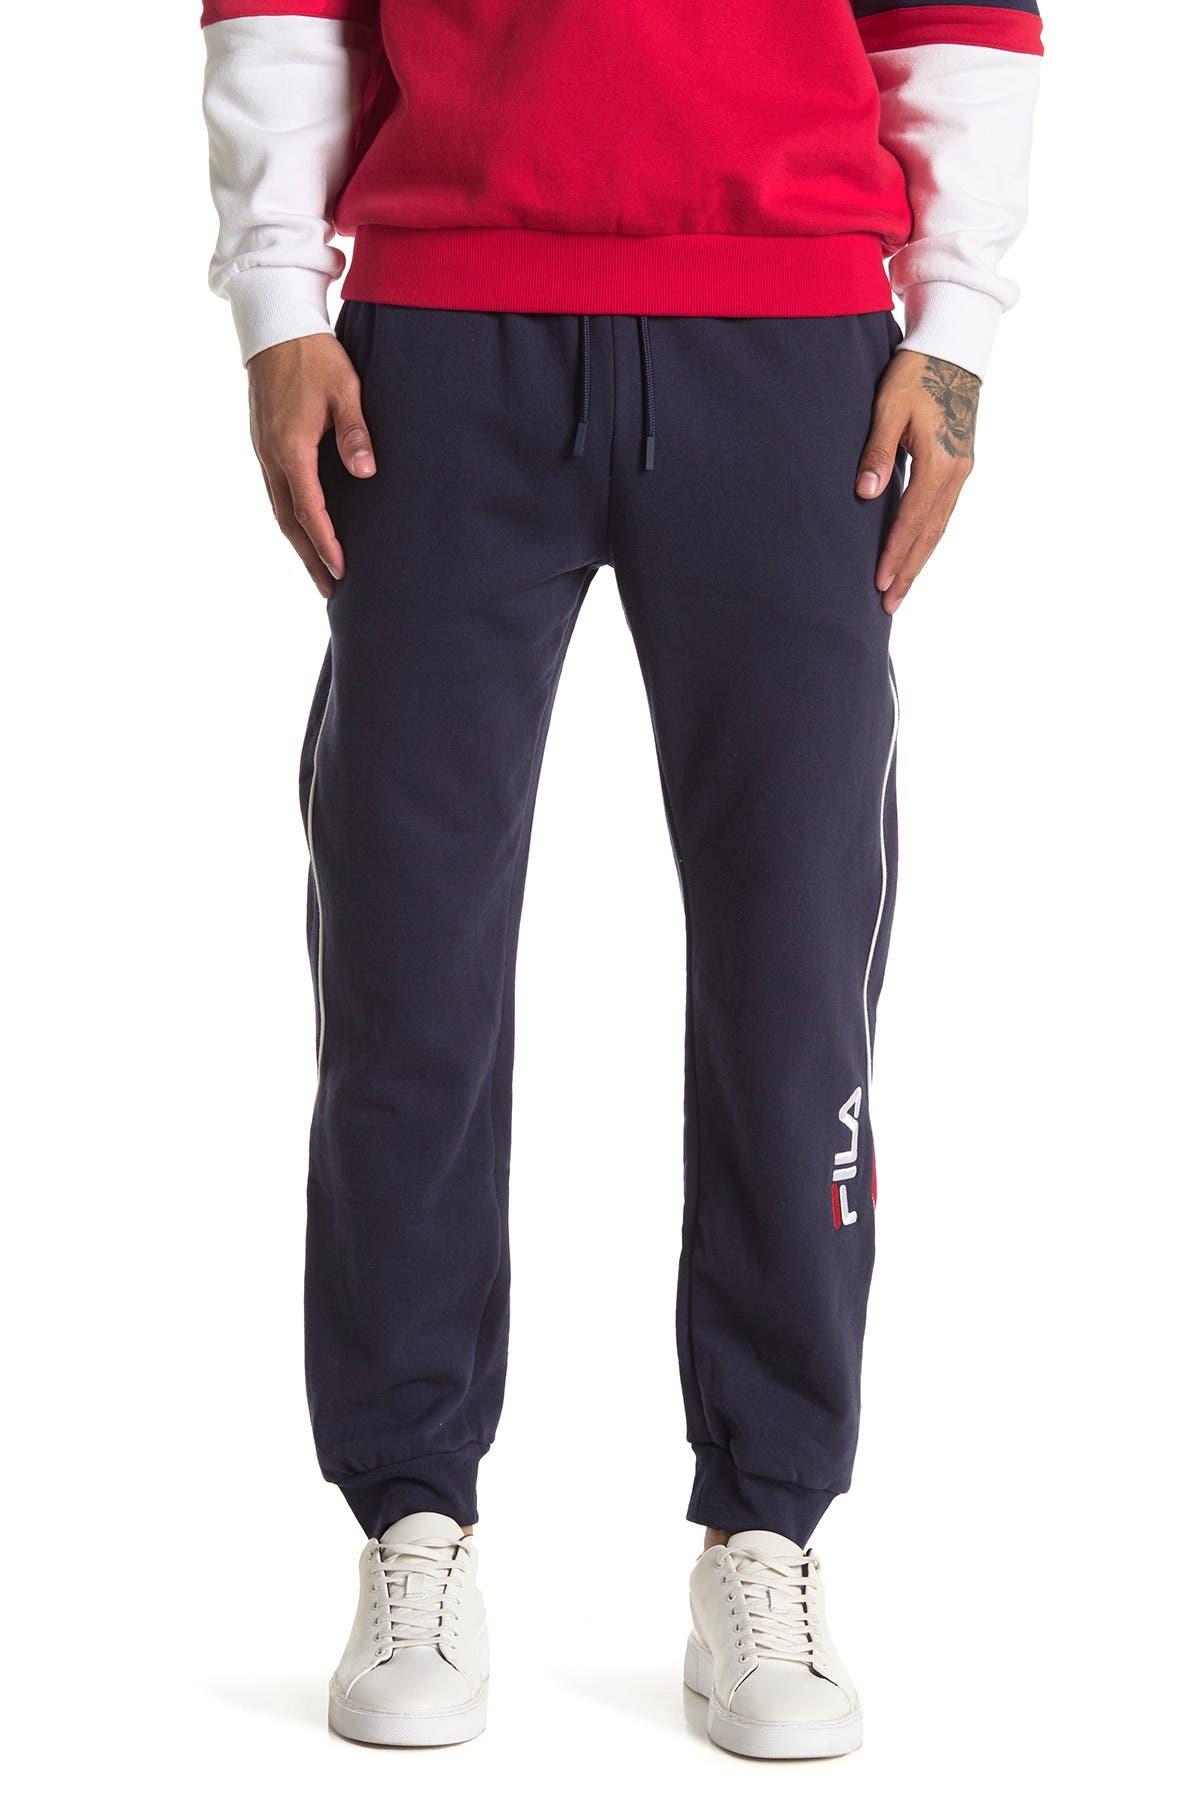 Image of FILA USA Ace Pants